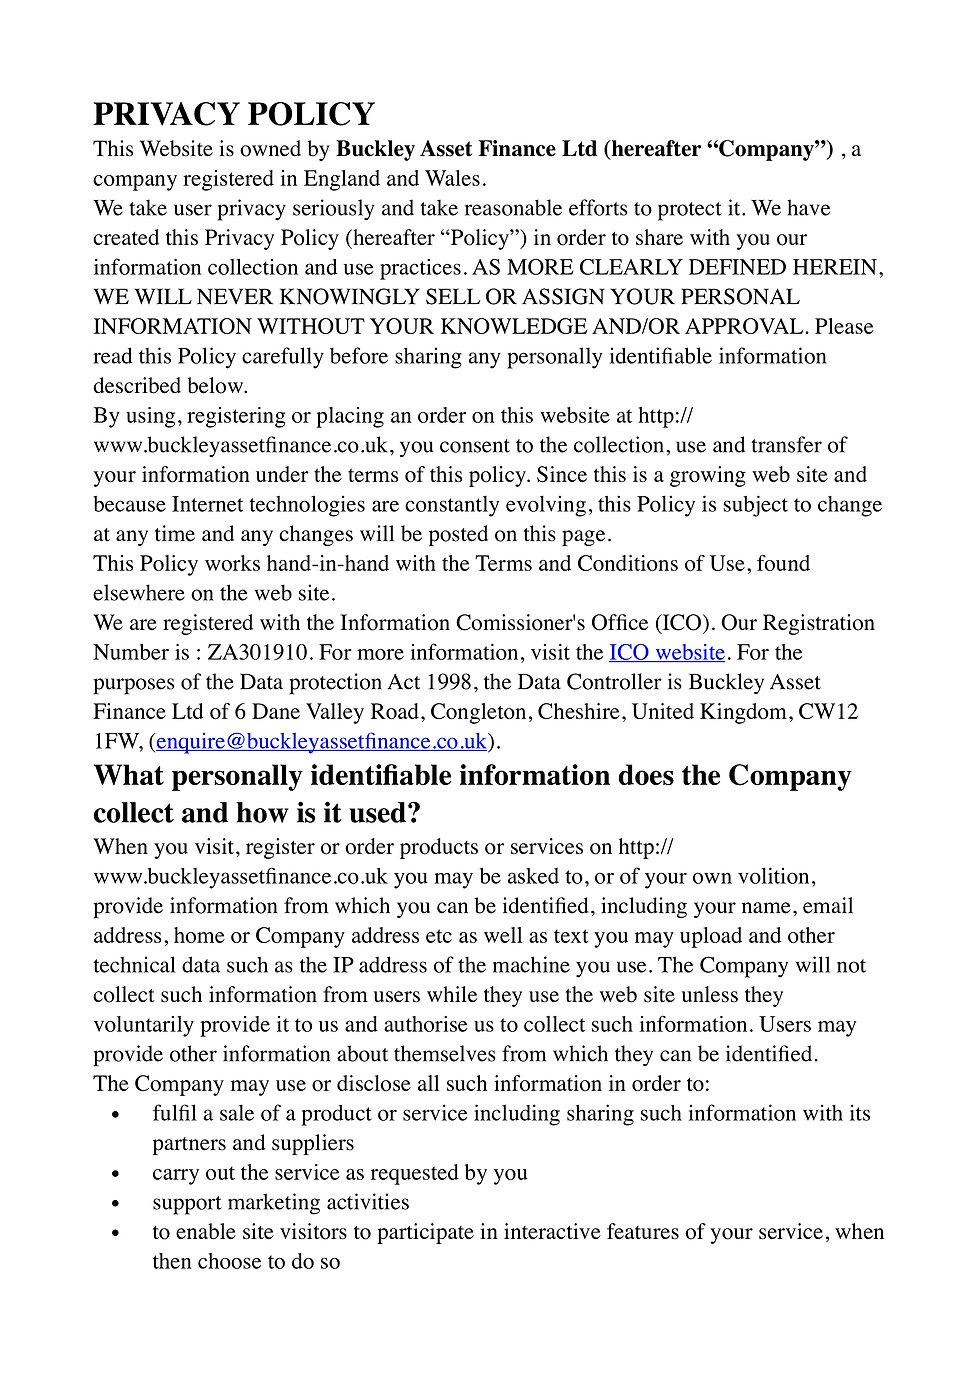 Buckey Asset Finance Ltd Privacy Policy 1